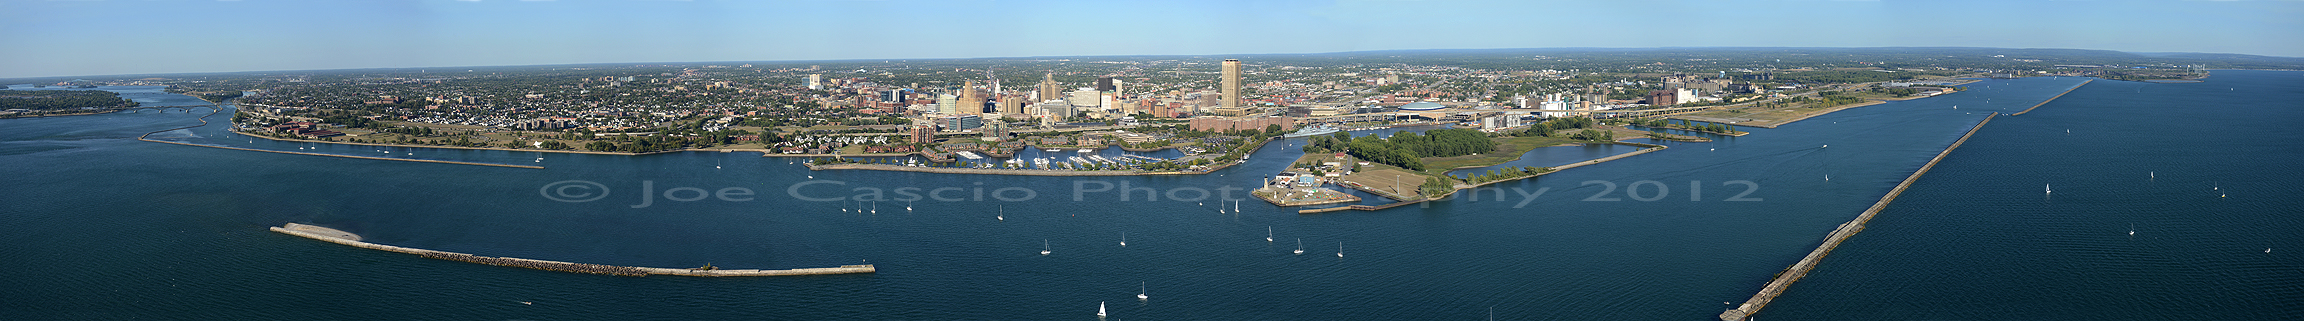 Waterfront_aerial_82912_jcascio.jpg